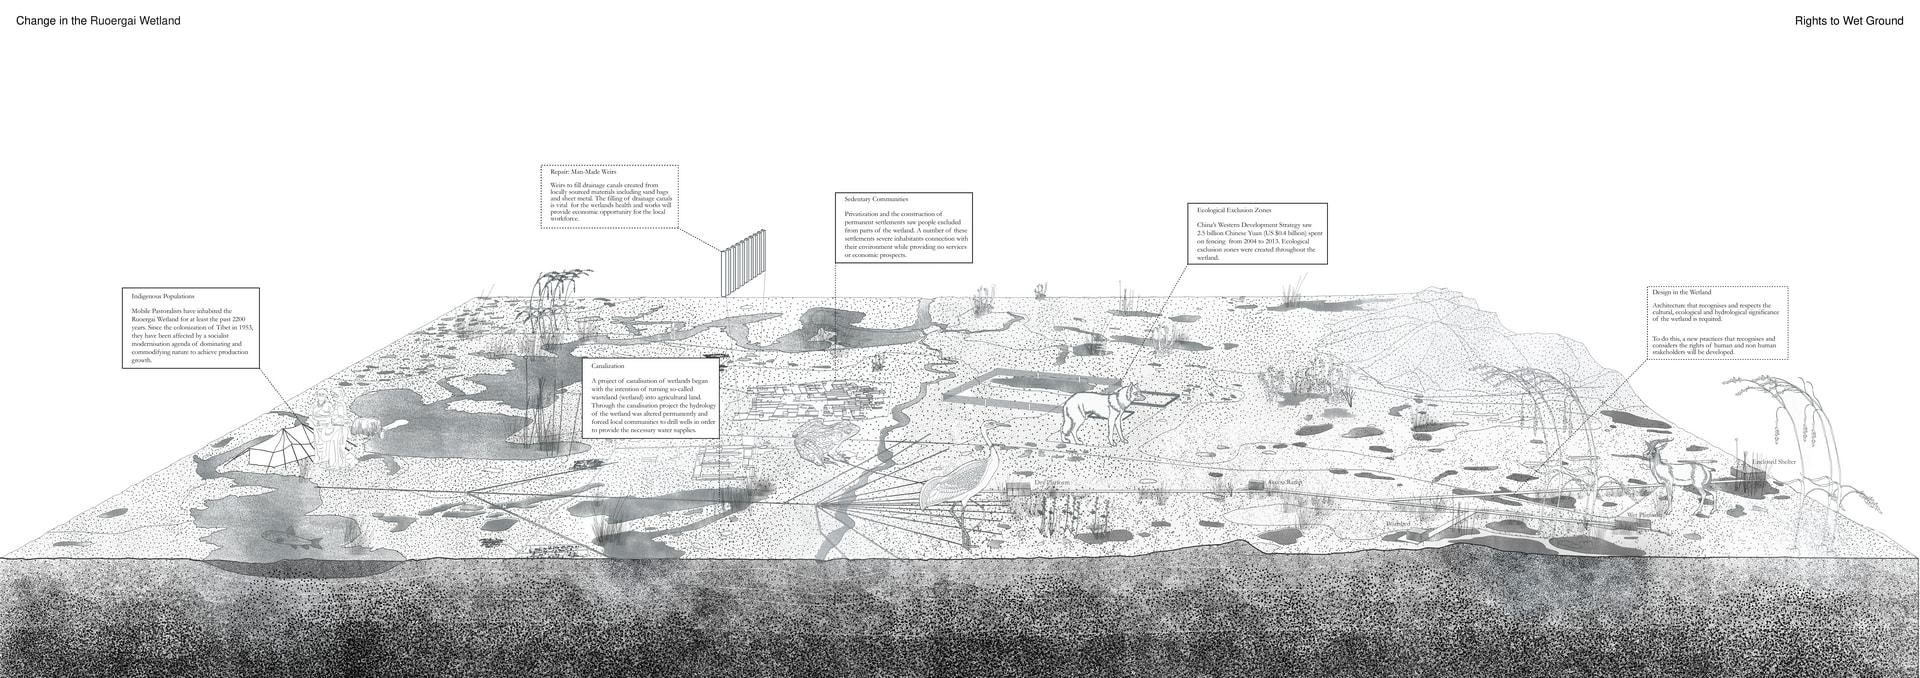 Change in the Ruoergai Wetland